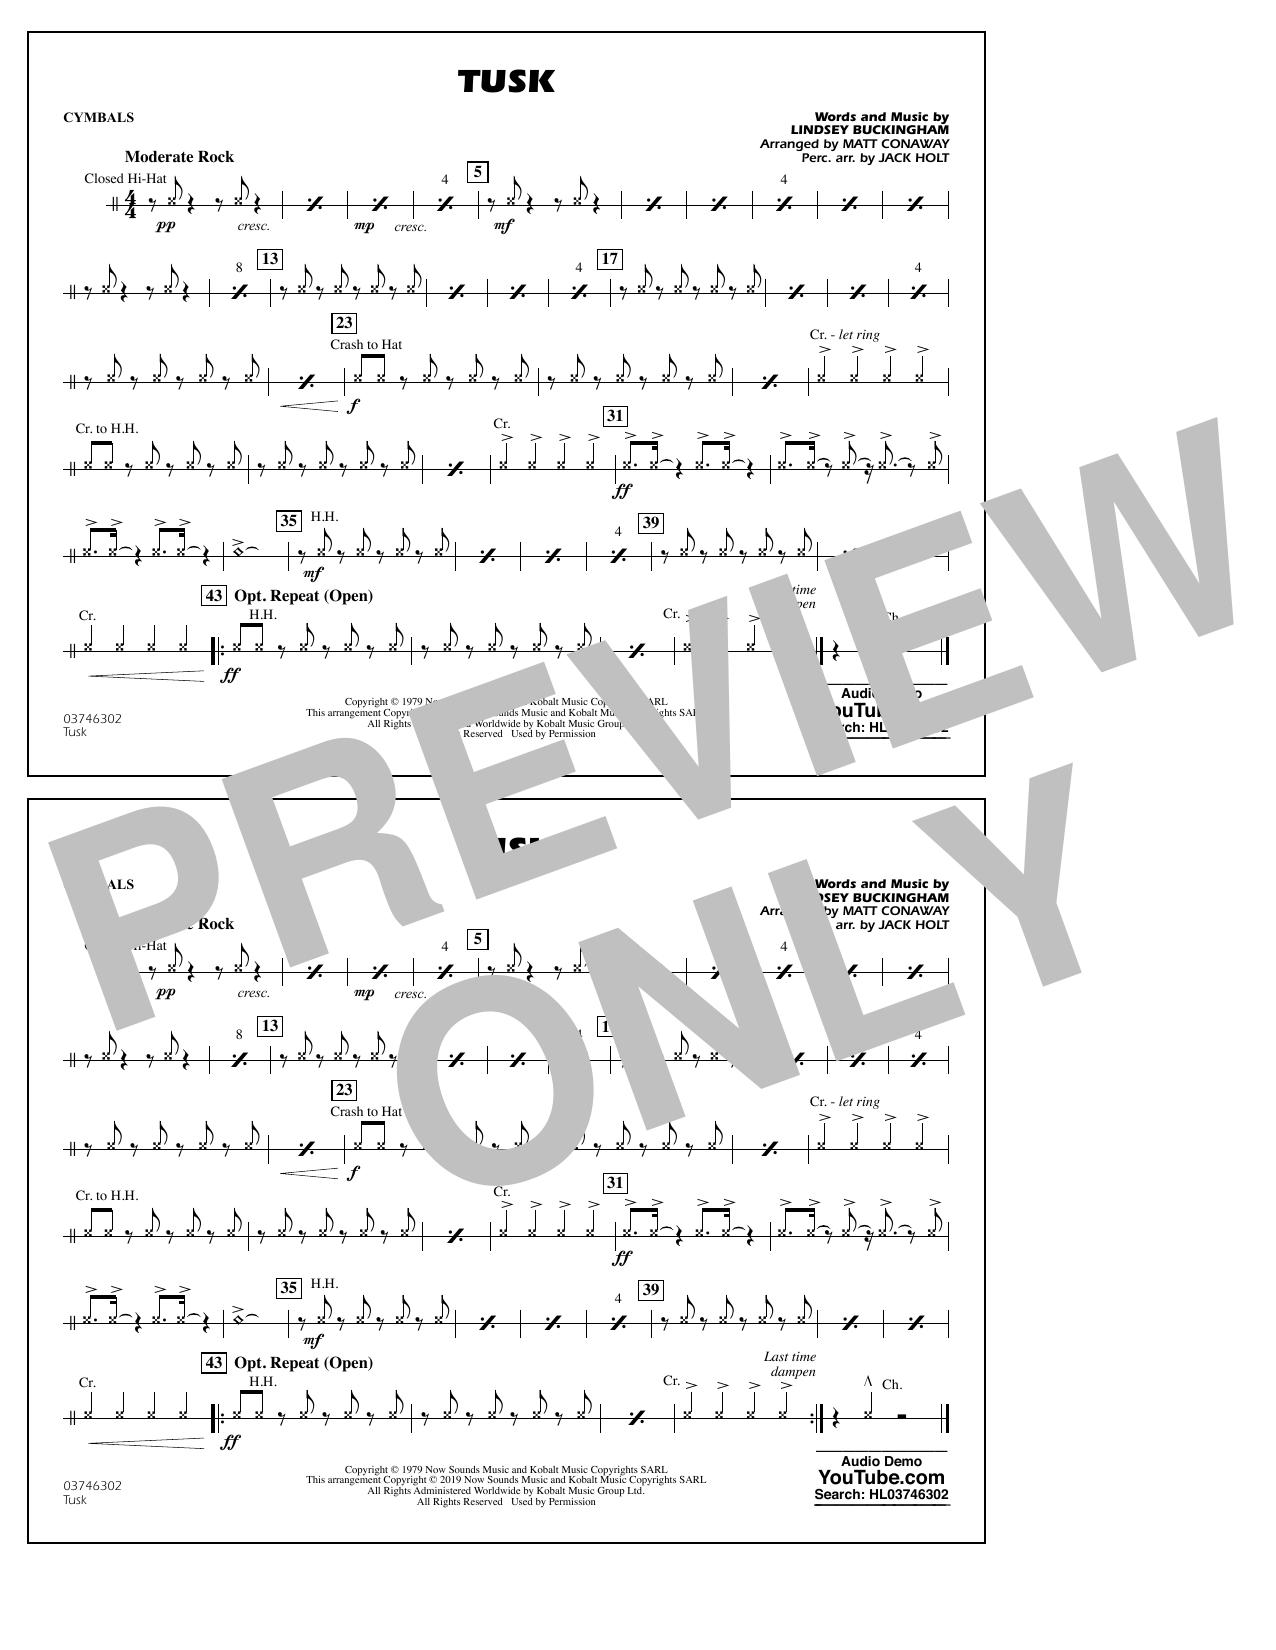 Fleetwood Mac Tusk (arr. Matt Conaway) - Cymbals sheet music notes and chords